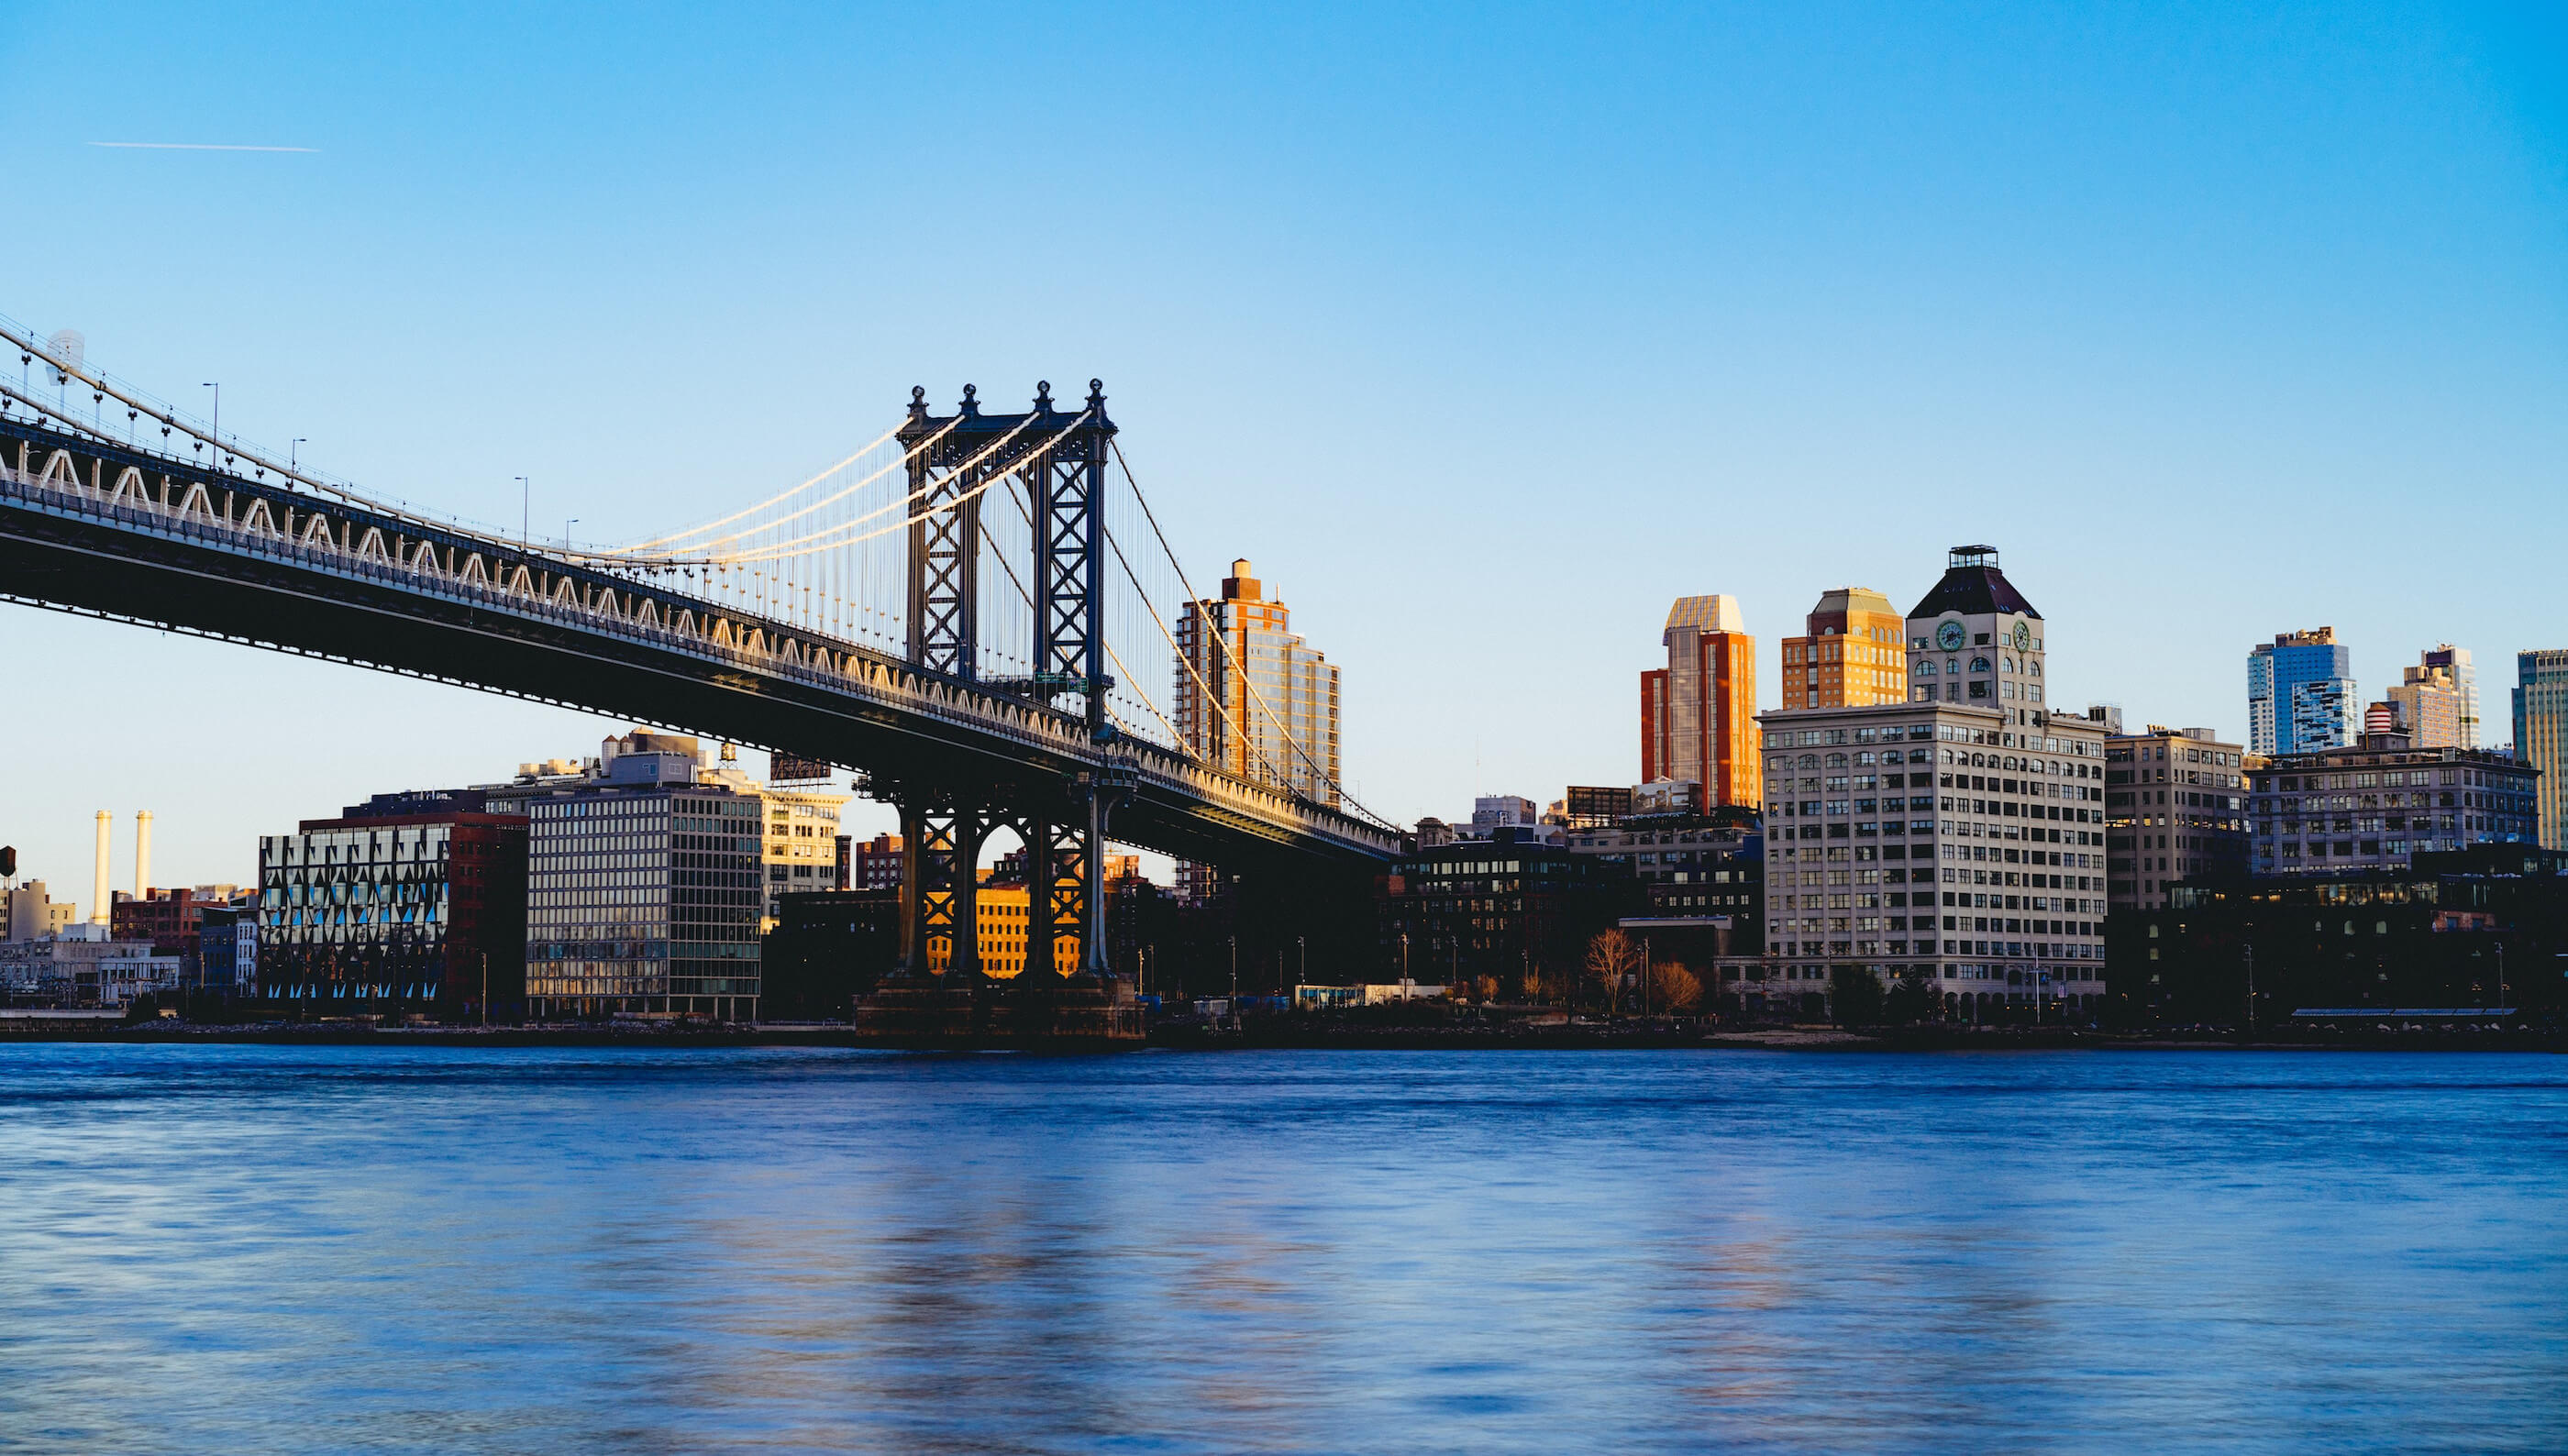 City Bridge Above the river